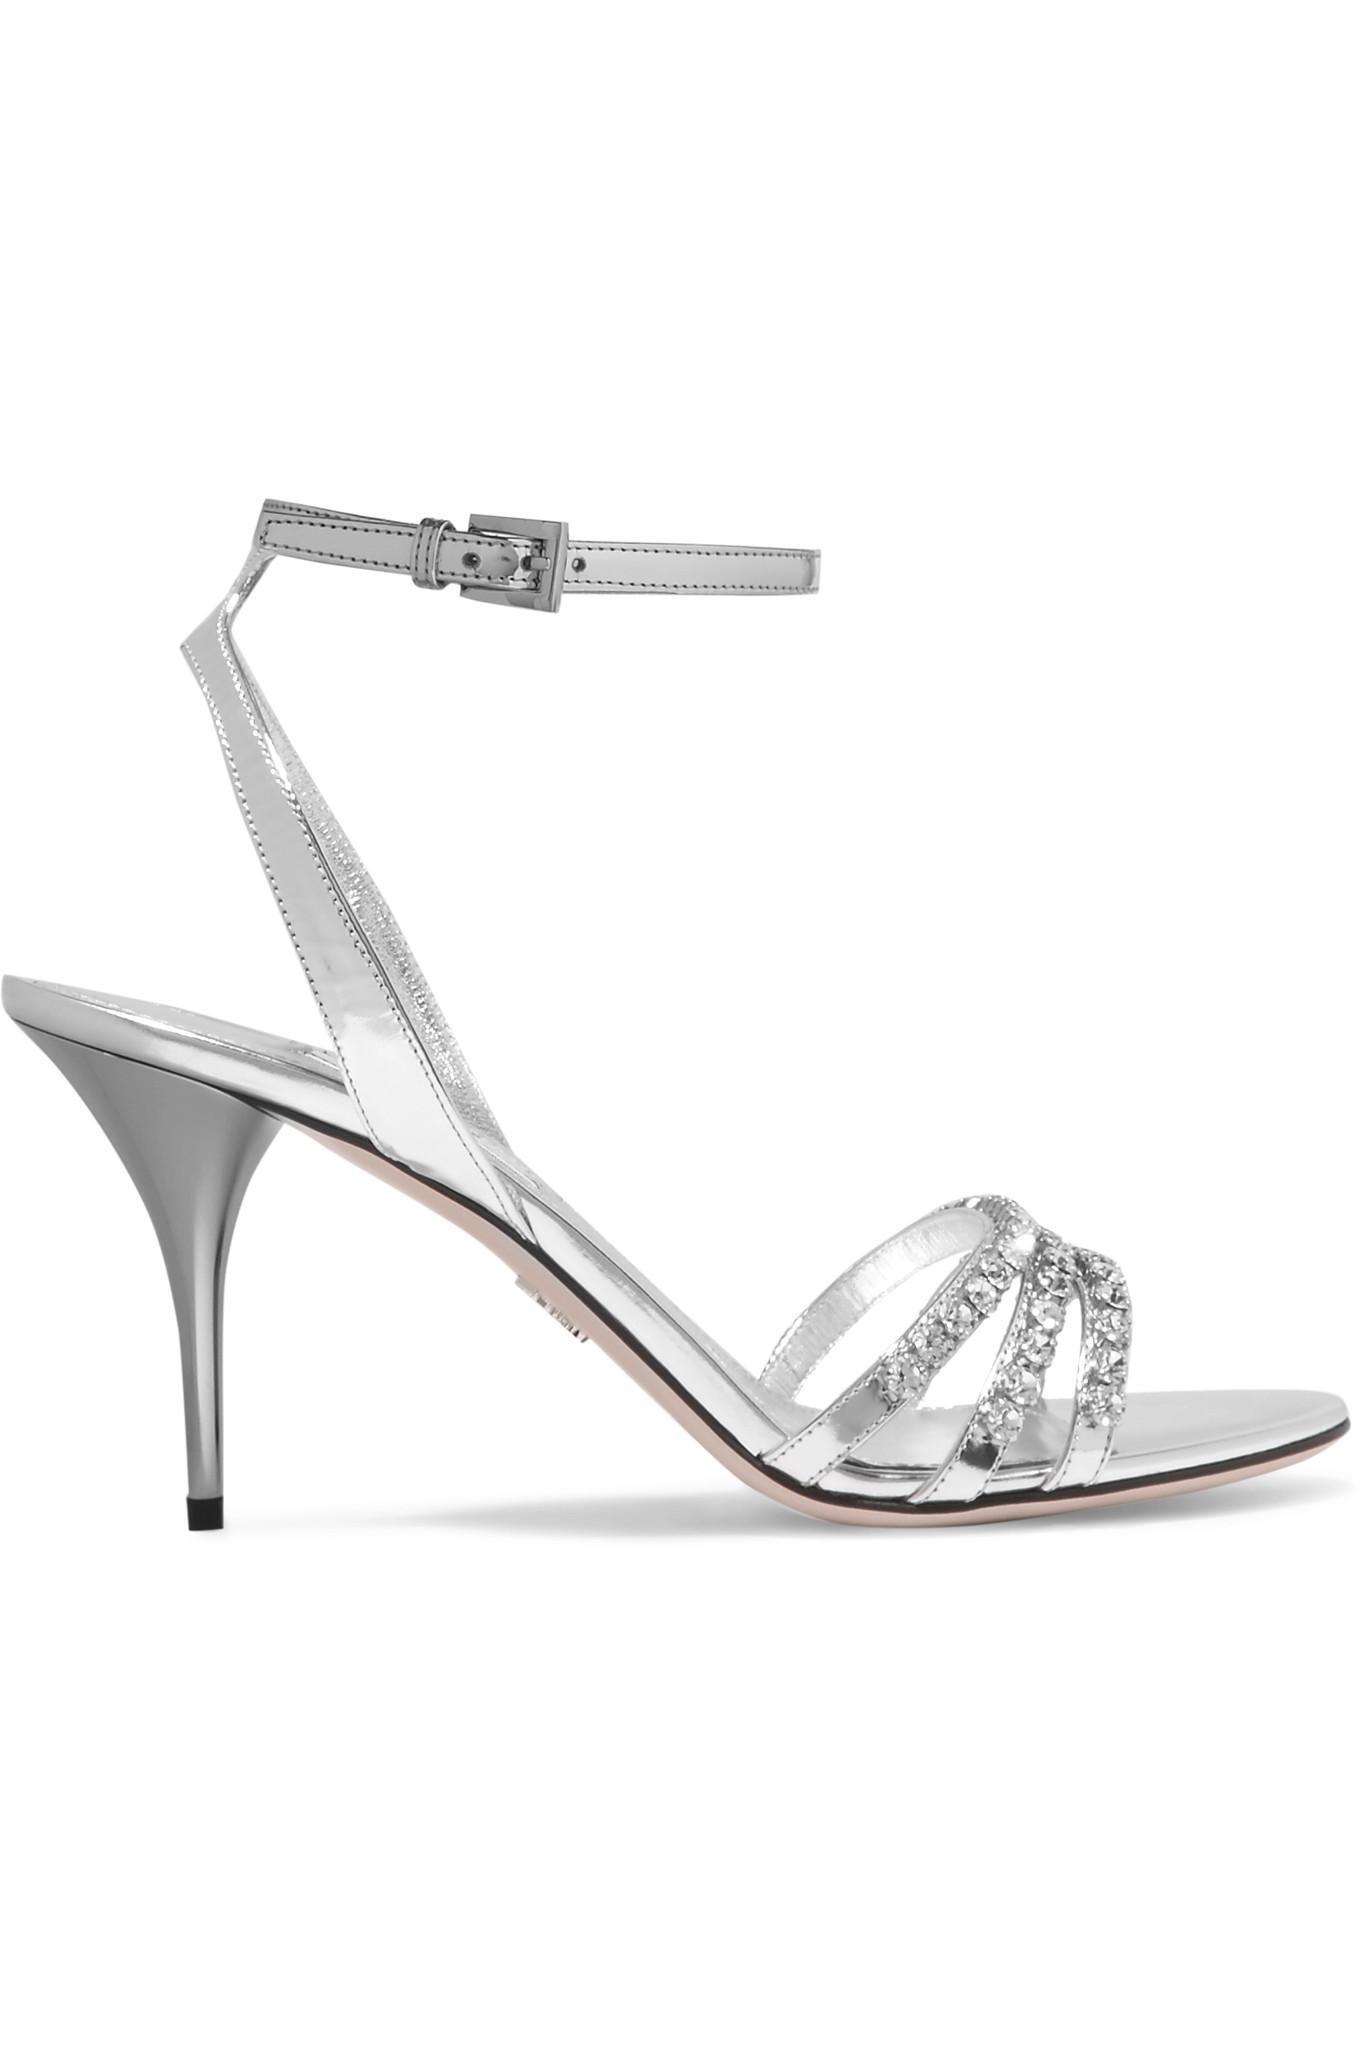 959d610cdee8a Lyst - Prada Crystal-embellished Metallic Leather Sandals in Metallic